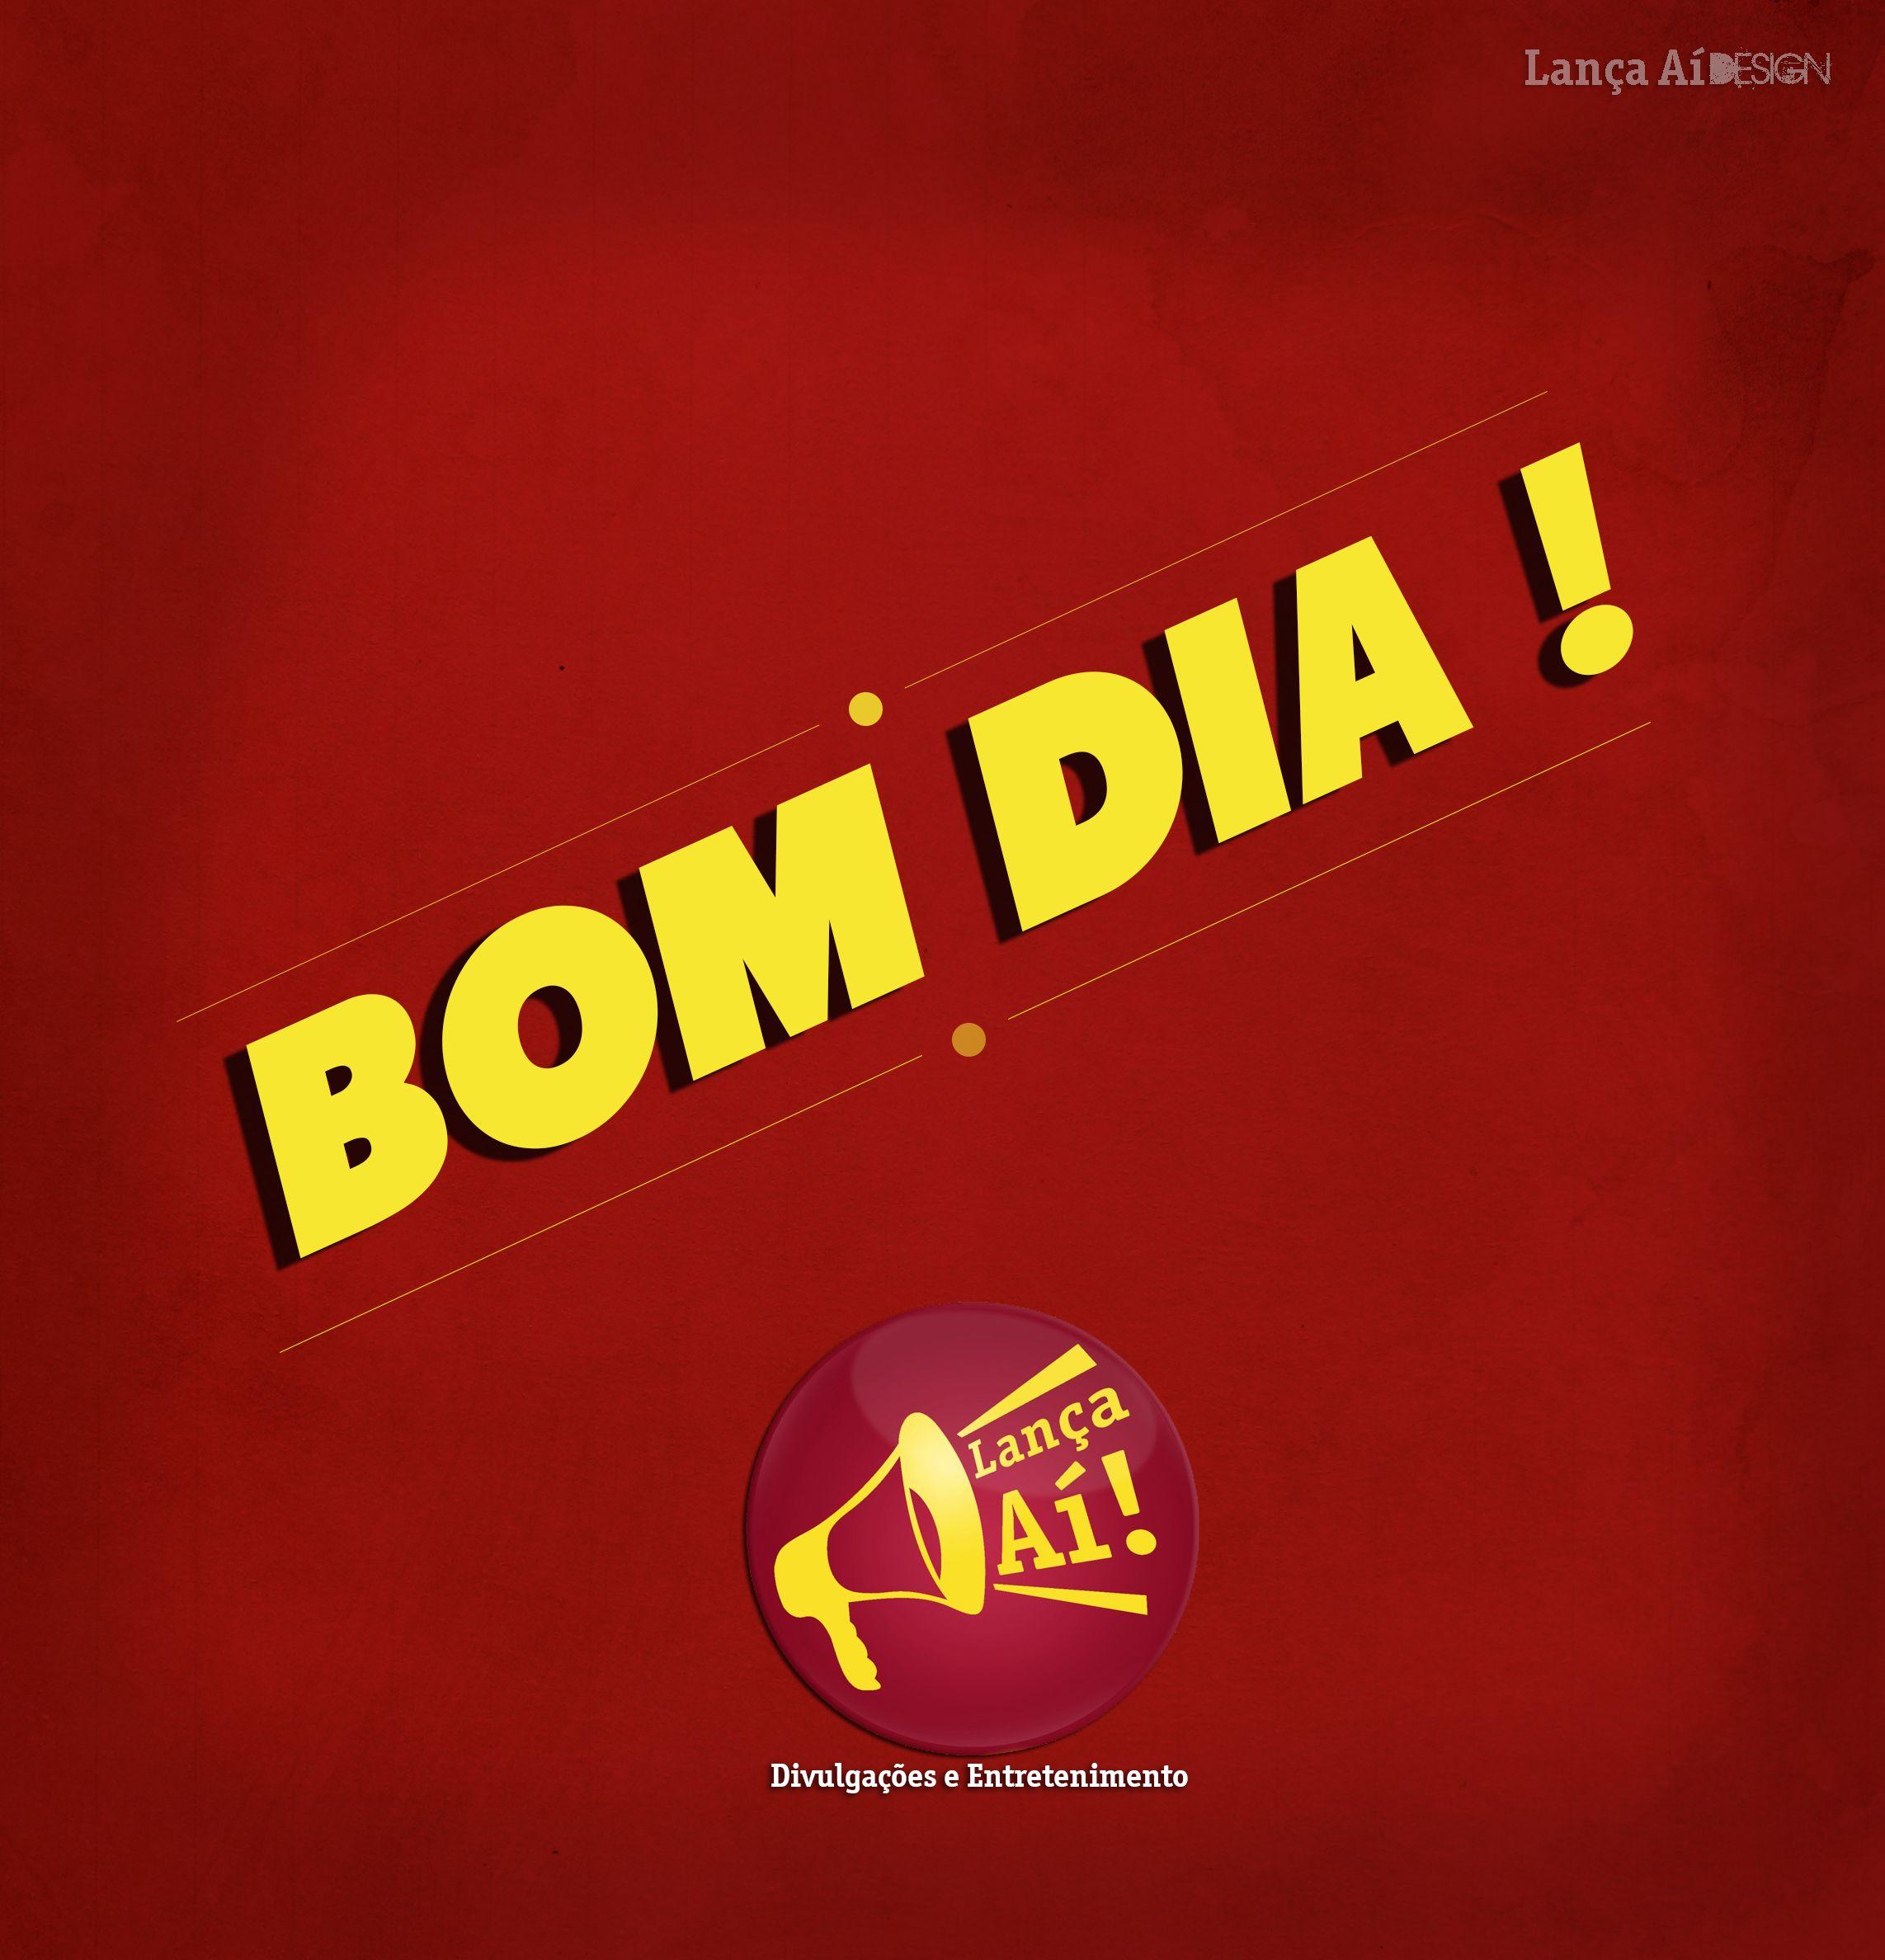 Bom dia! #5 By: Thomaz Amora